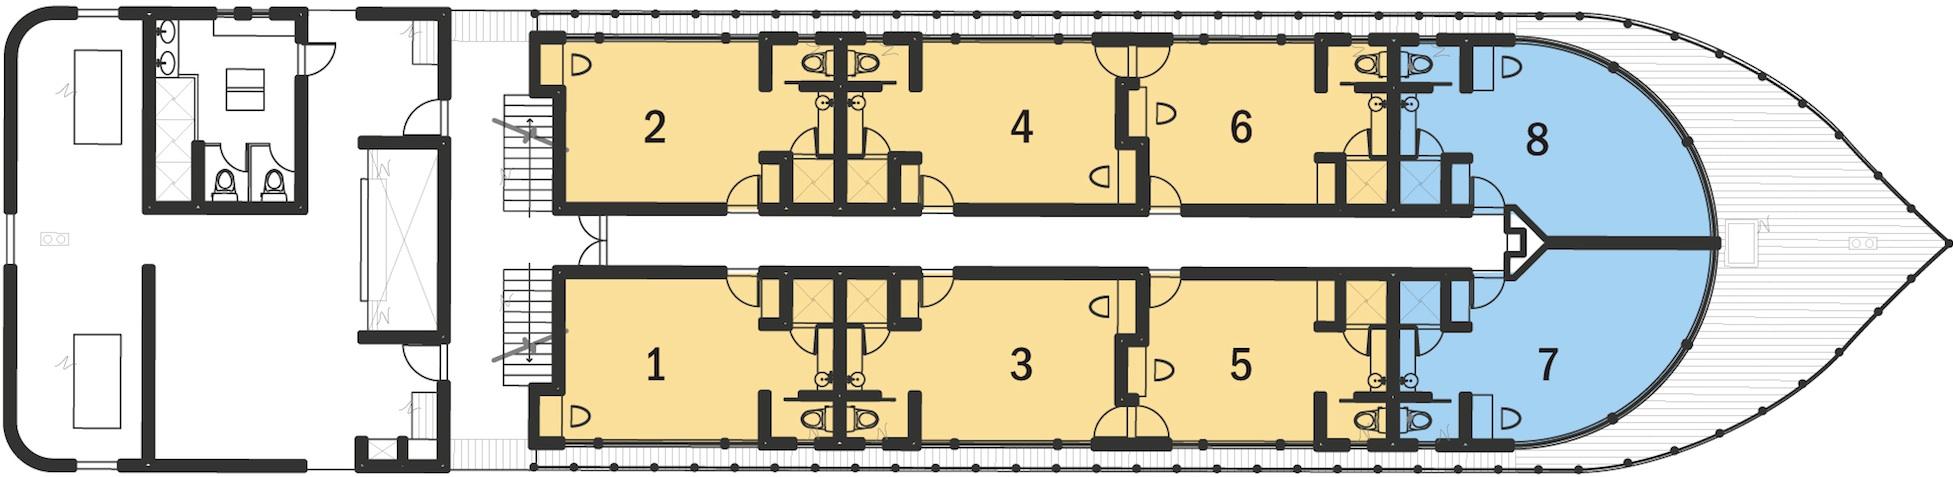 Lindblad Expeditions Delfin II Deckplans Main Deck.jpg